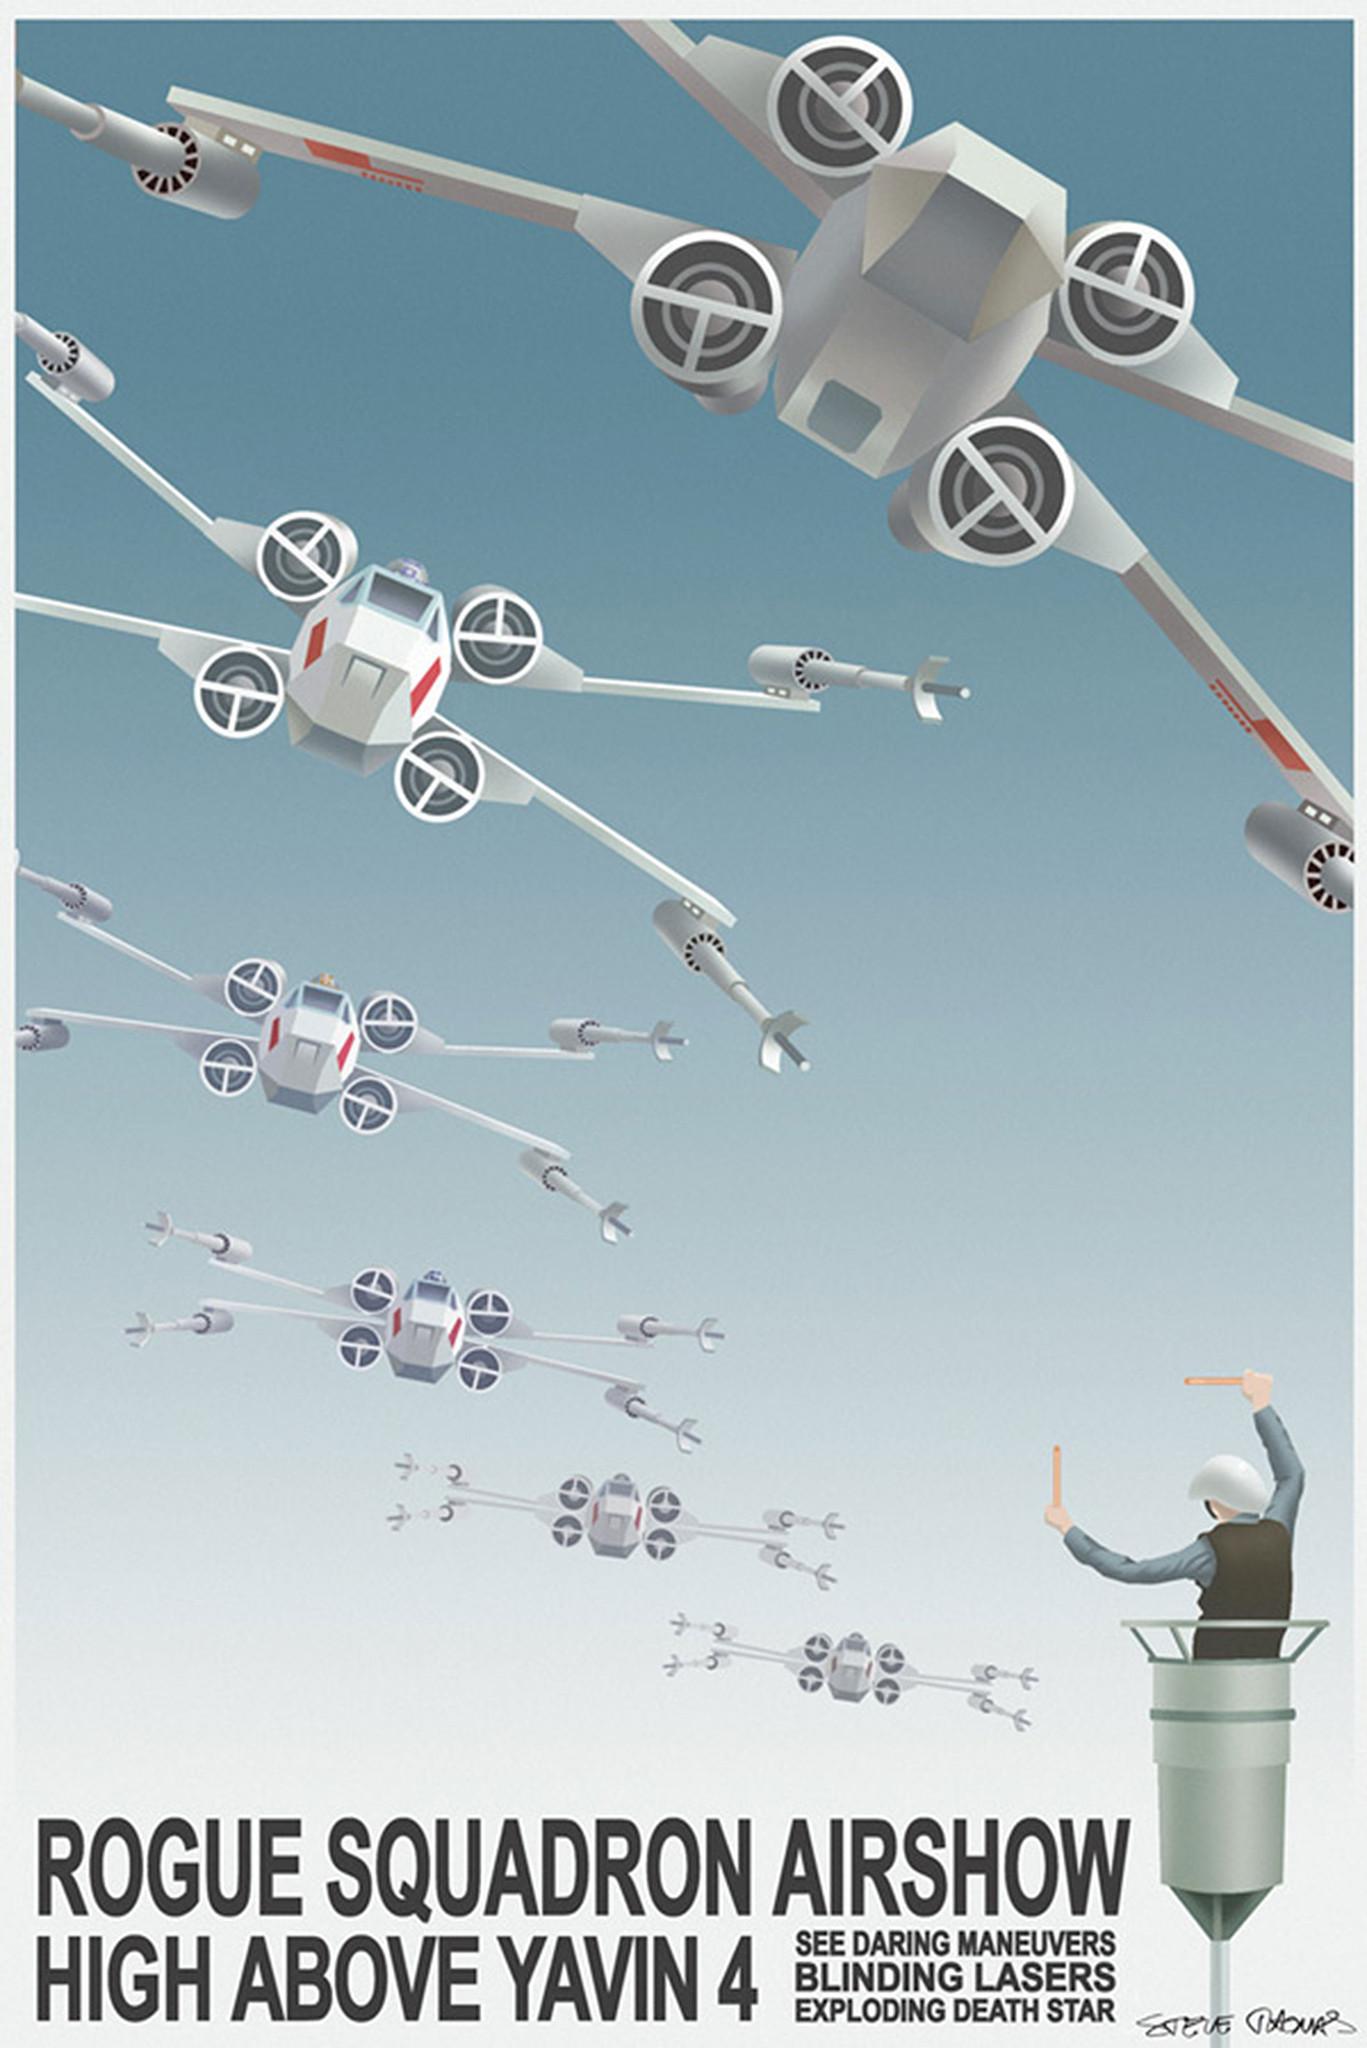 star-wars-travel-posters-steve-thomas-7